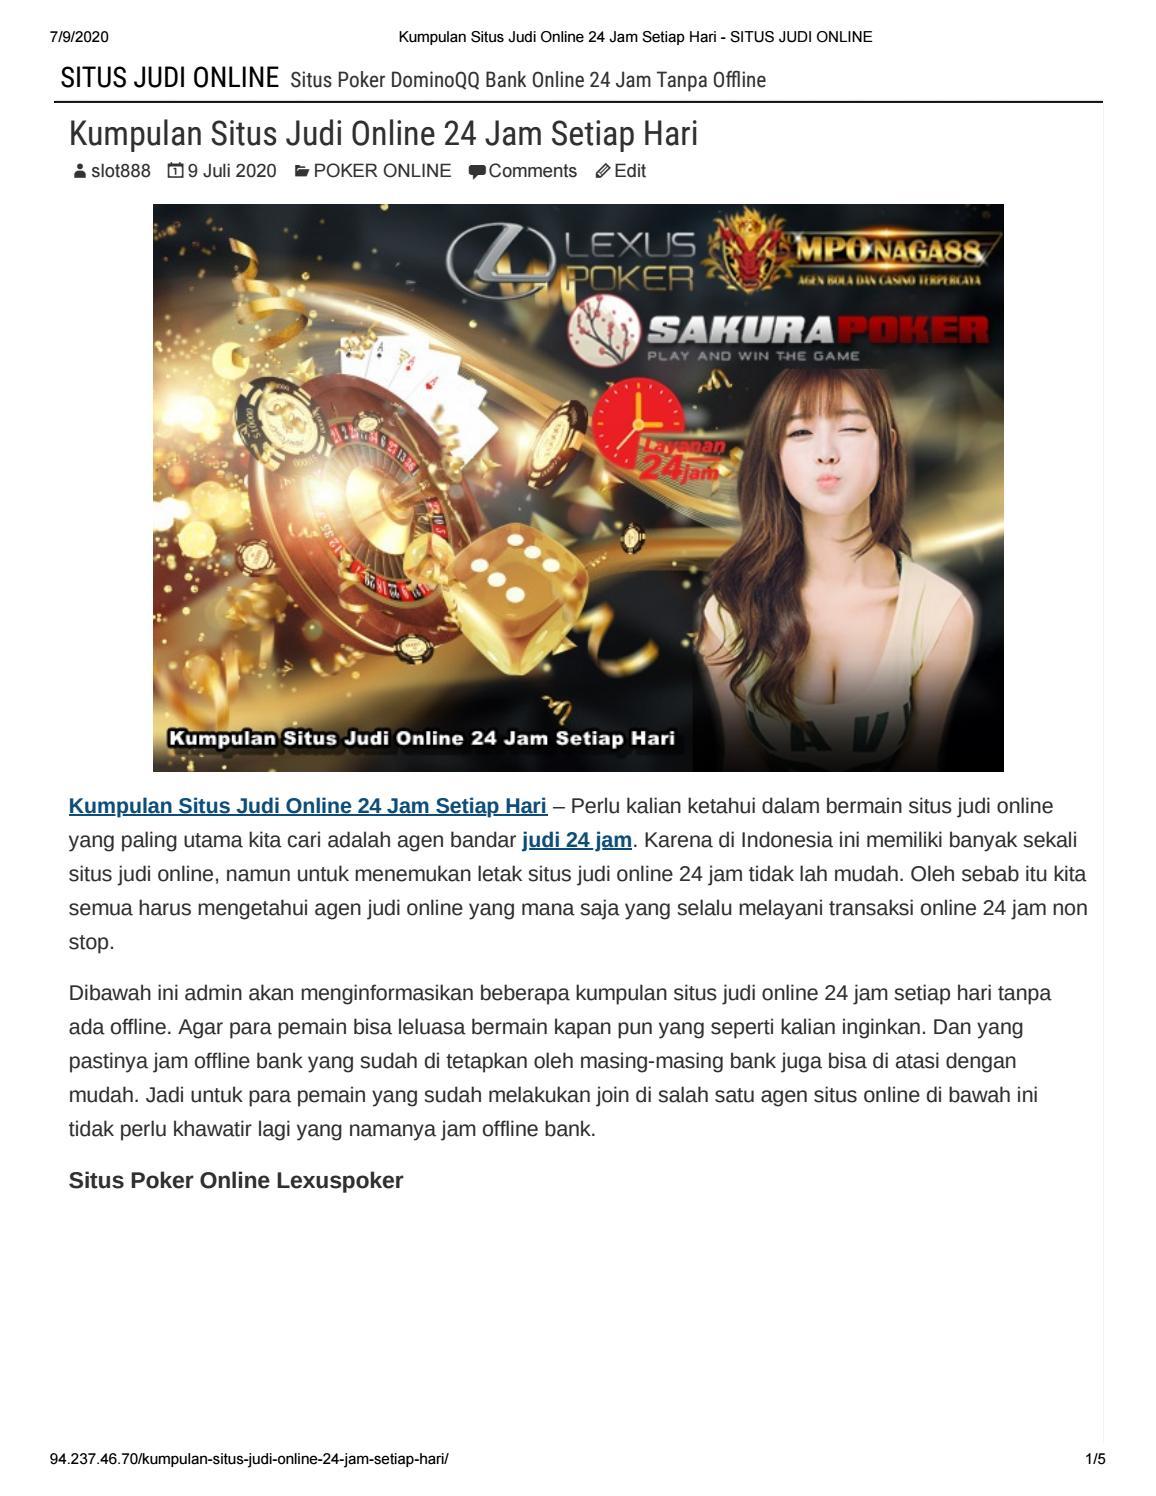 Mponaga88 Kumpulan Situs Judi Online 24 Jam Setiap Hari By Sakurapoker Issuu